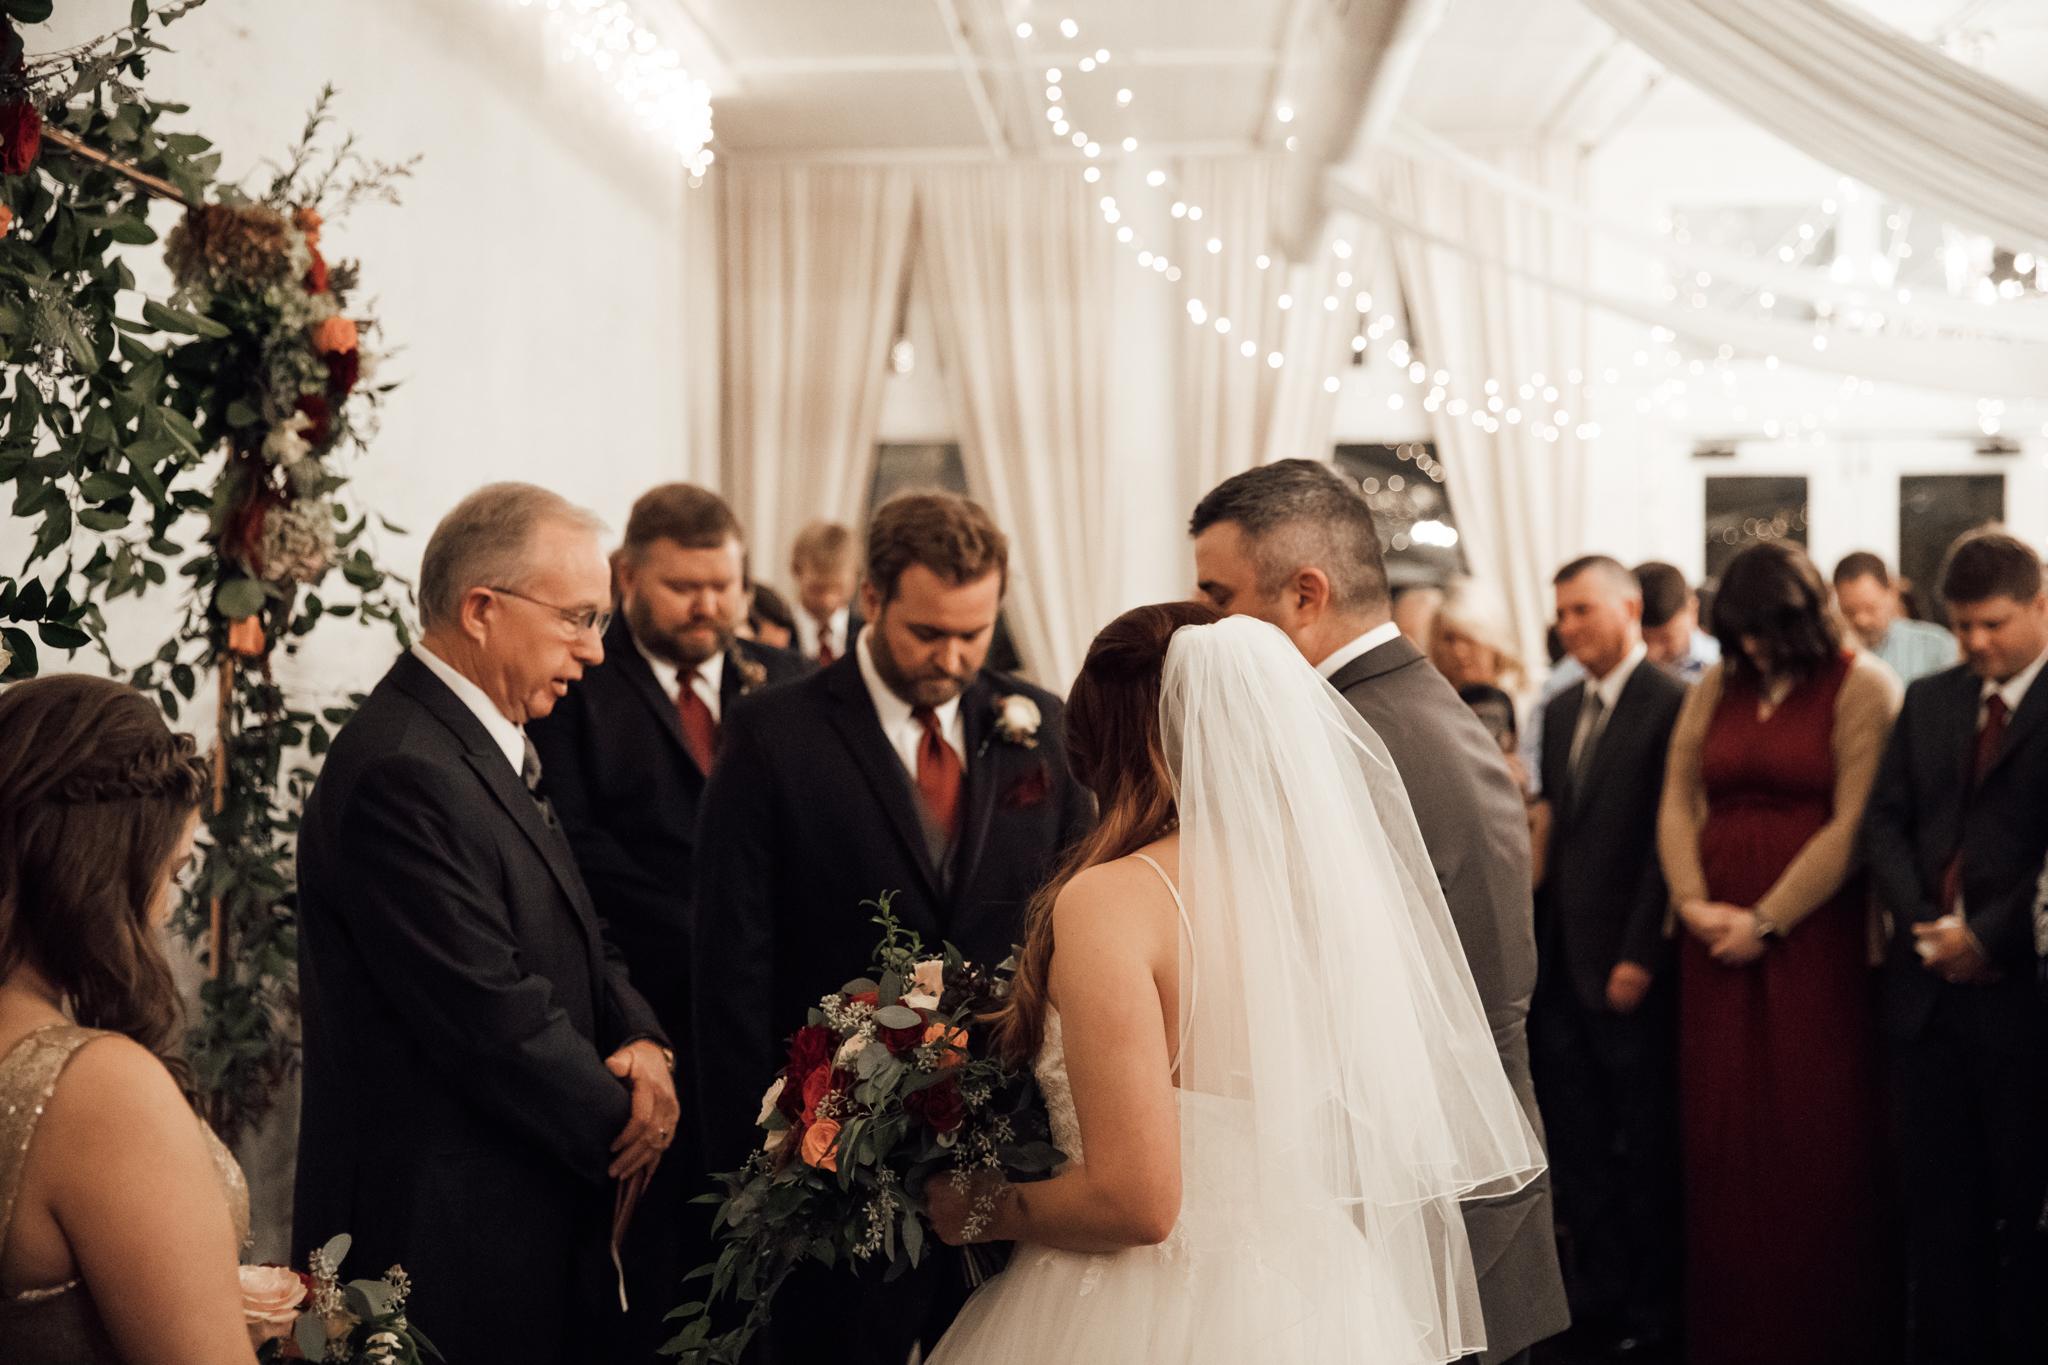 memphis-wedding-photographers-thewarmtharoundyou-ballinese-ballroom (140 of 232).jpg